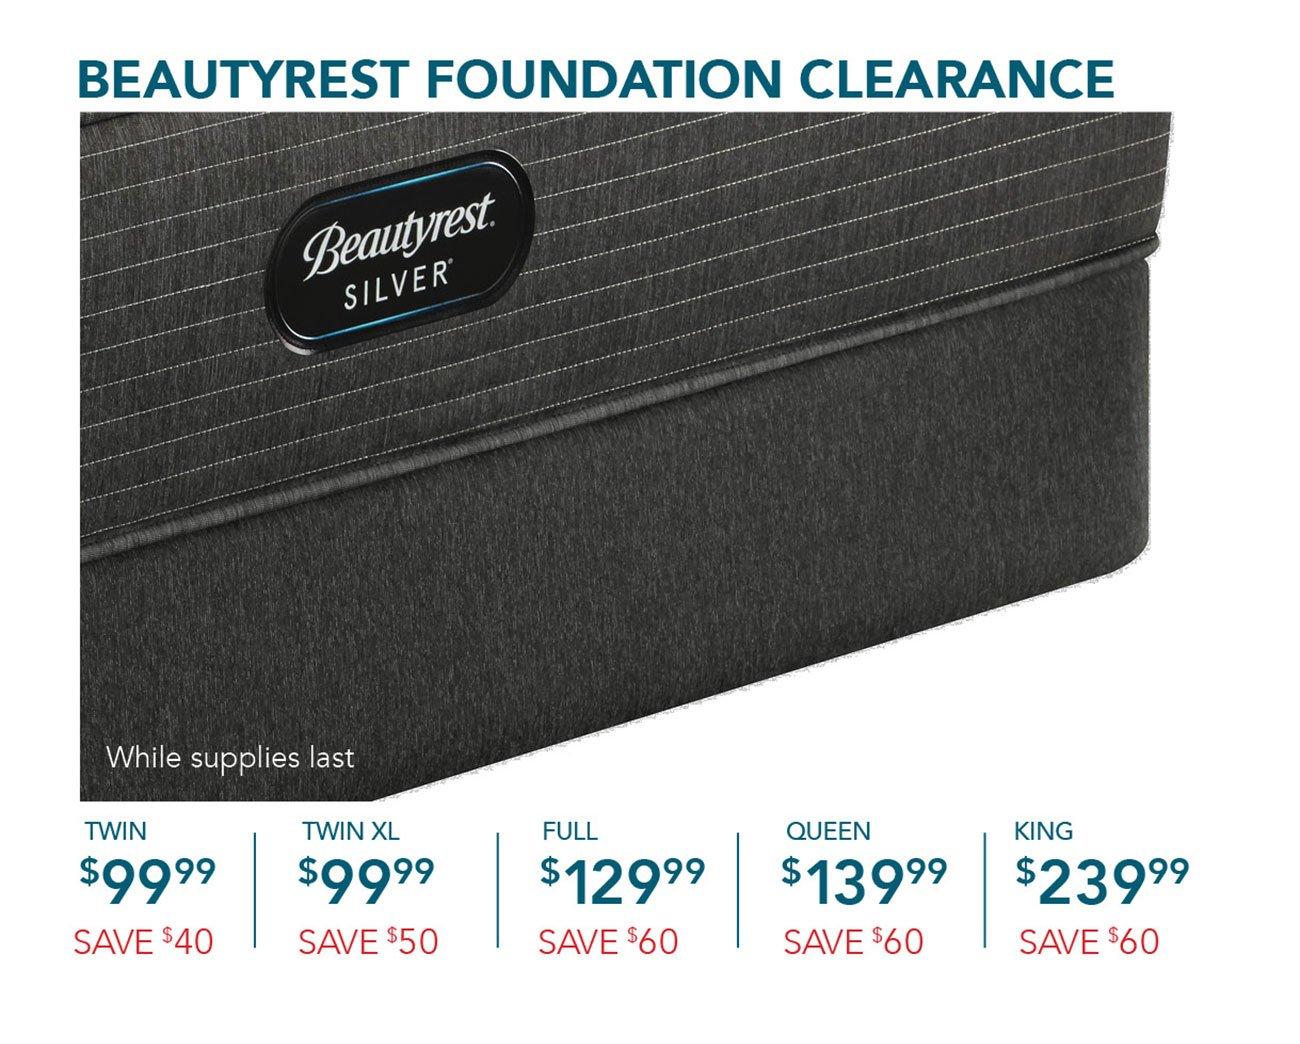 Beautyrest-Foundation-clearance